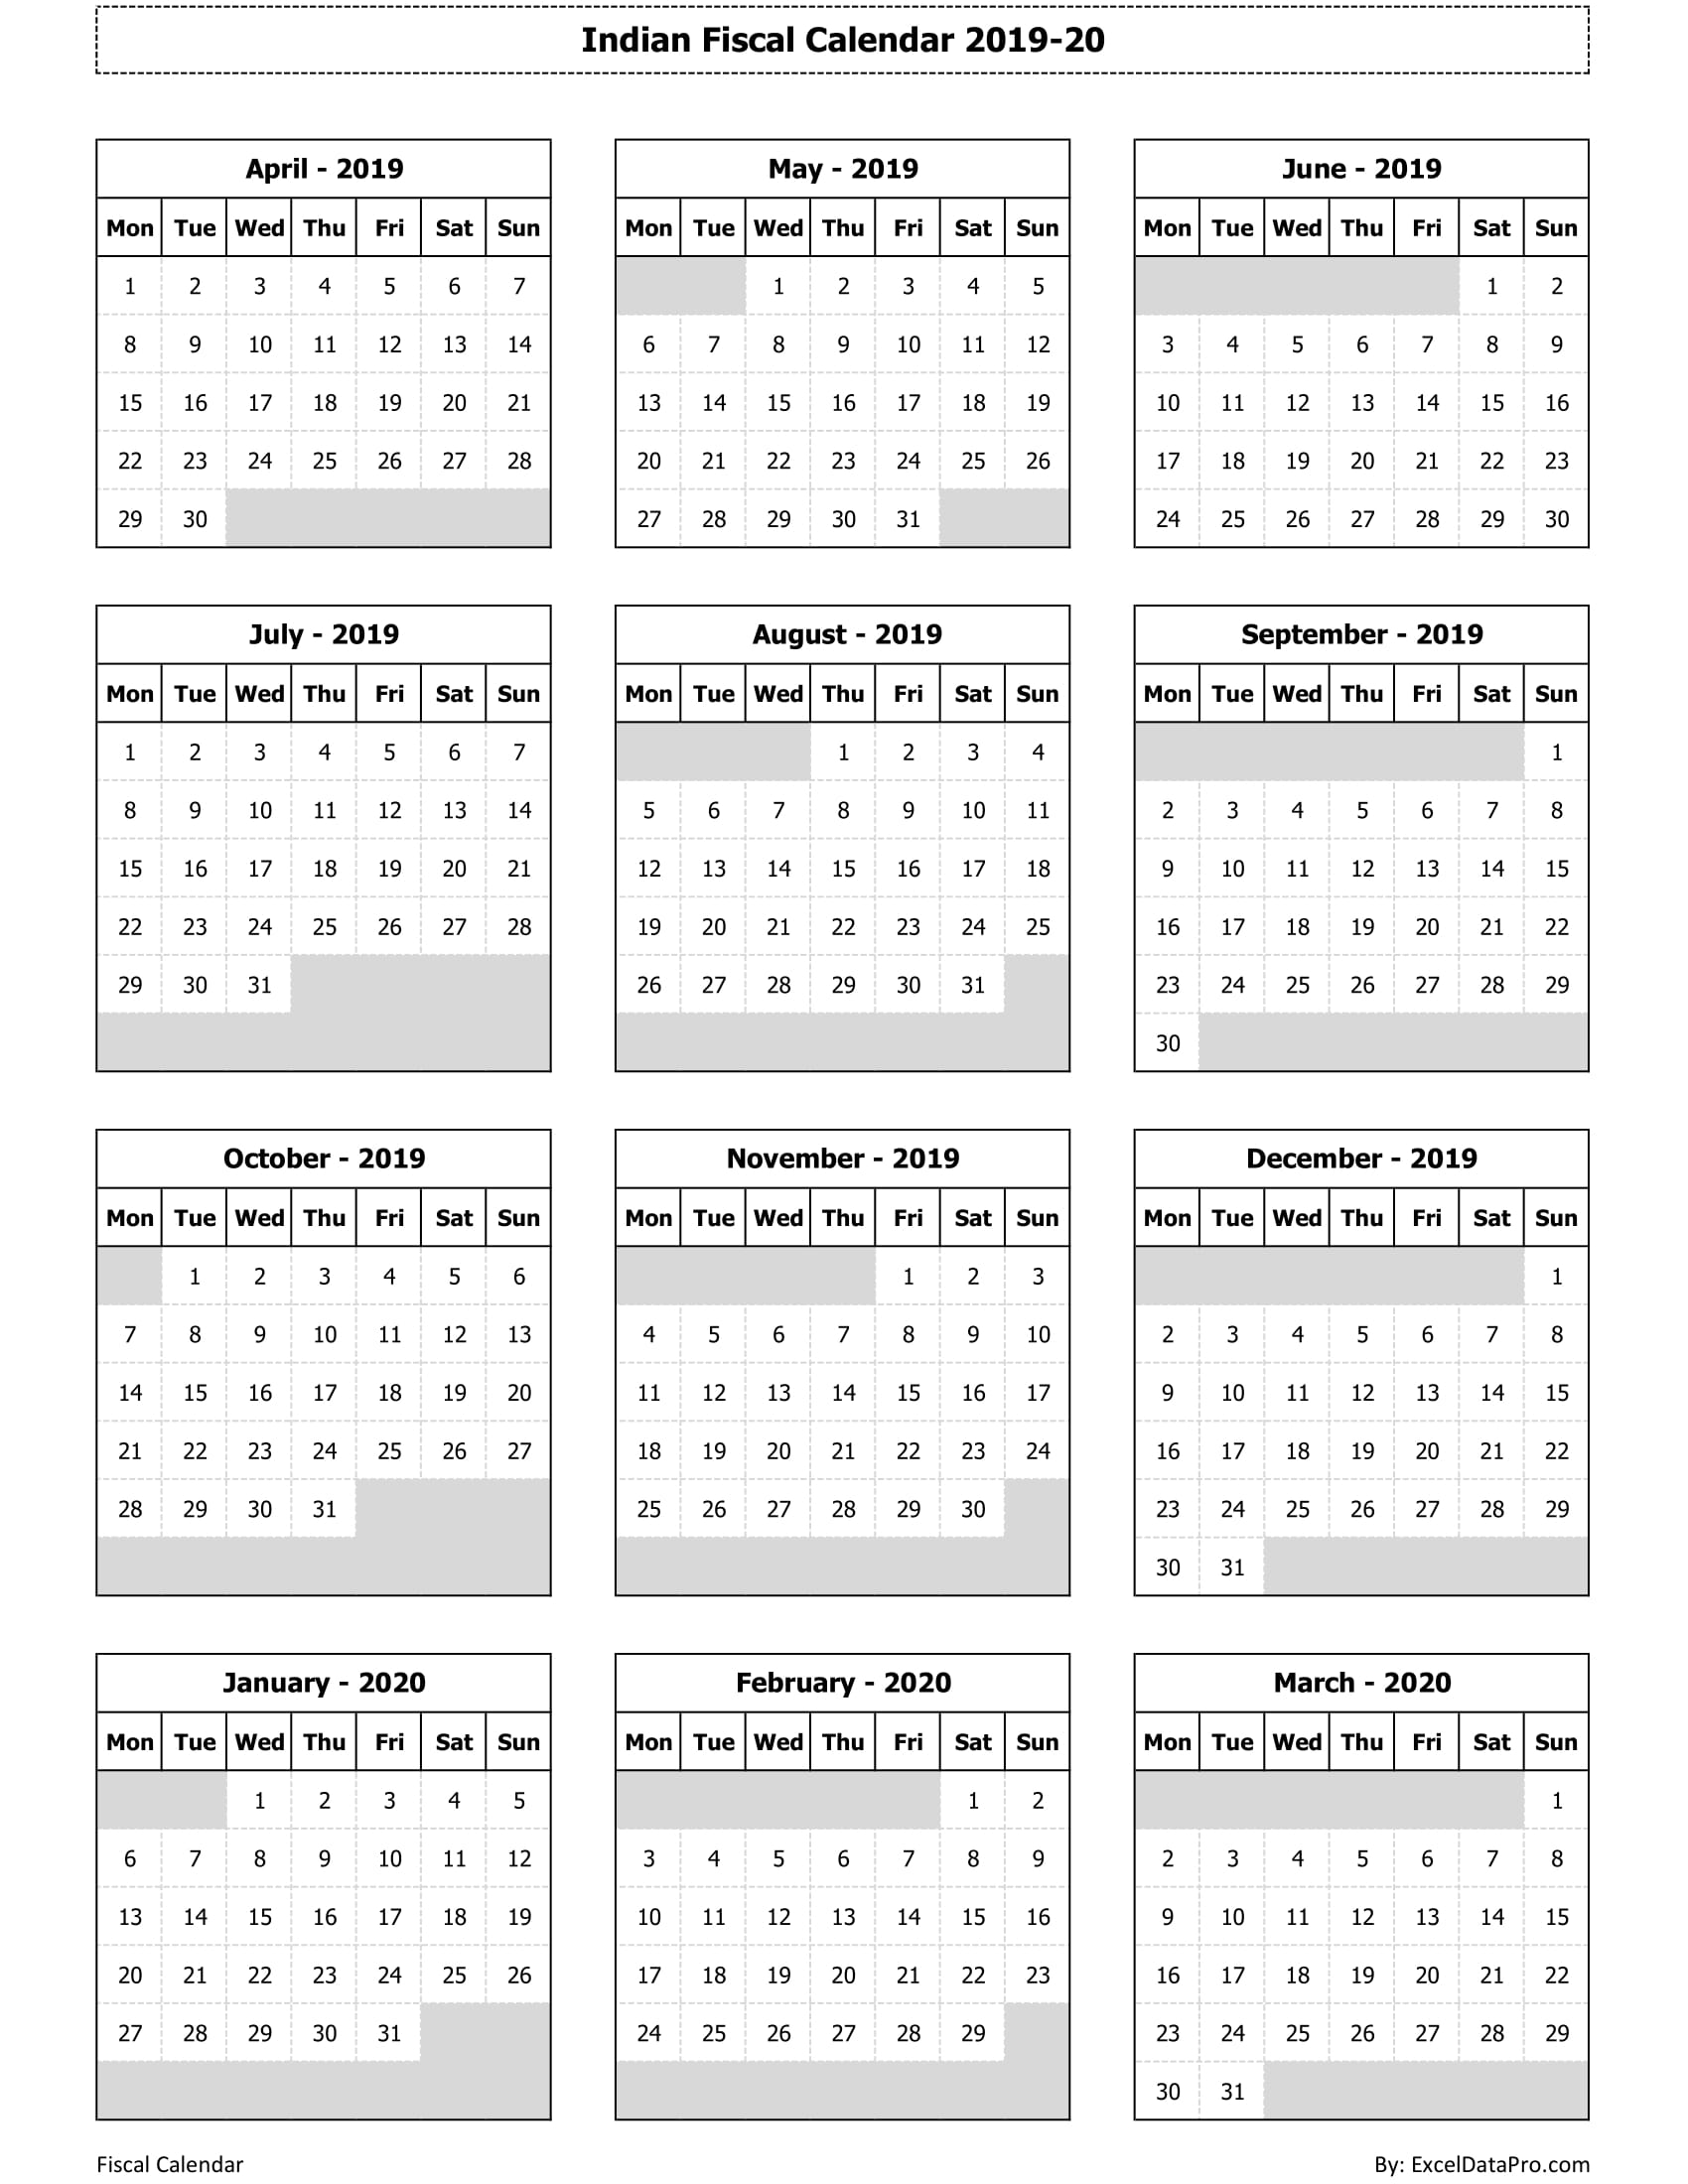 download indian fiscal calendar 2019